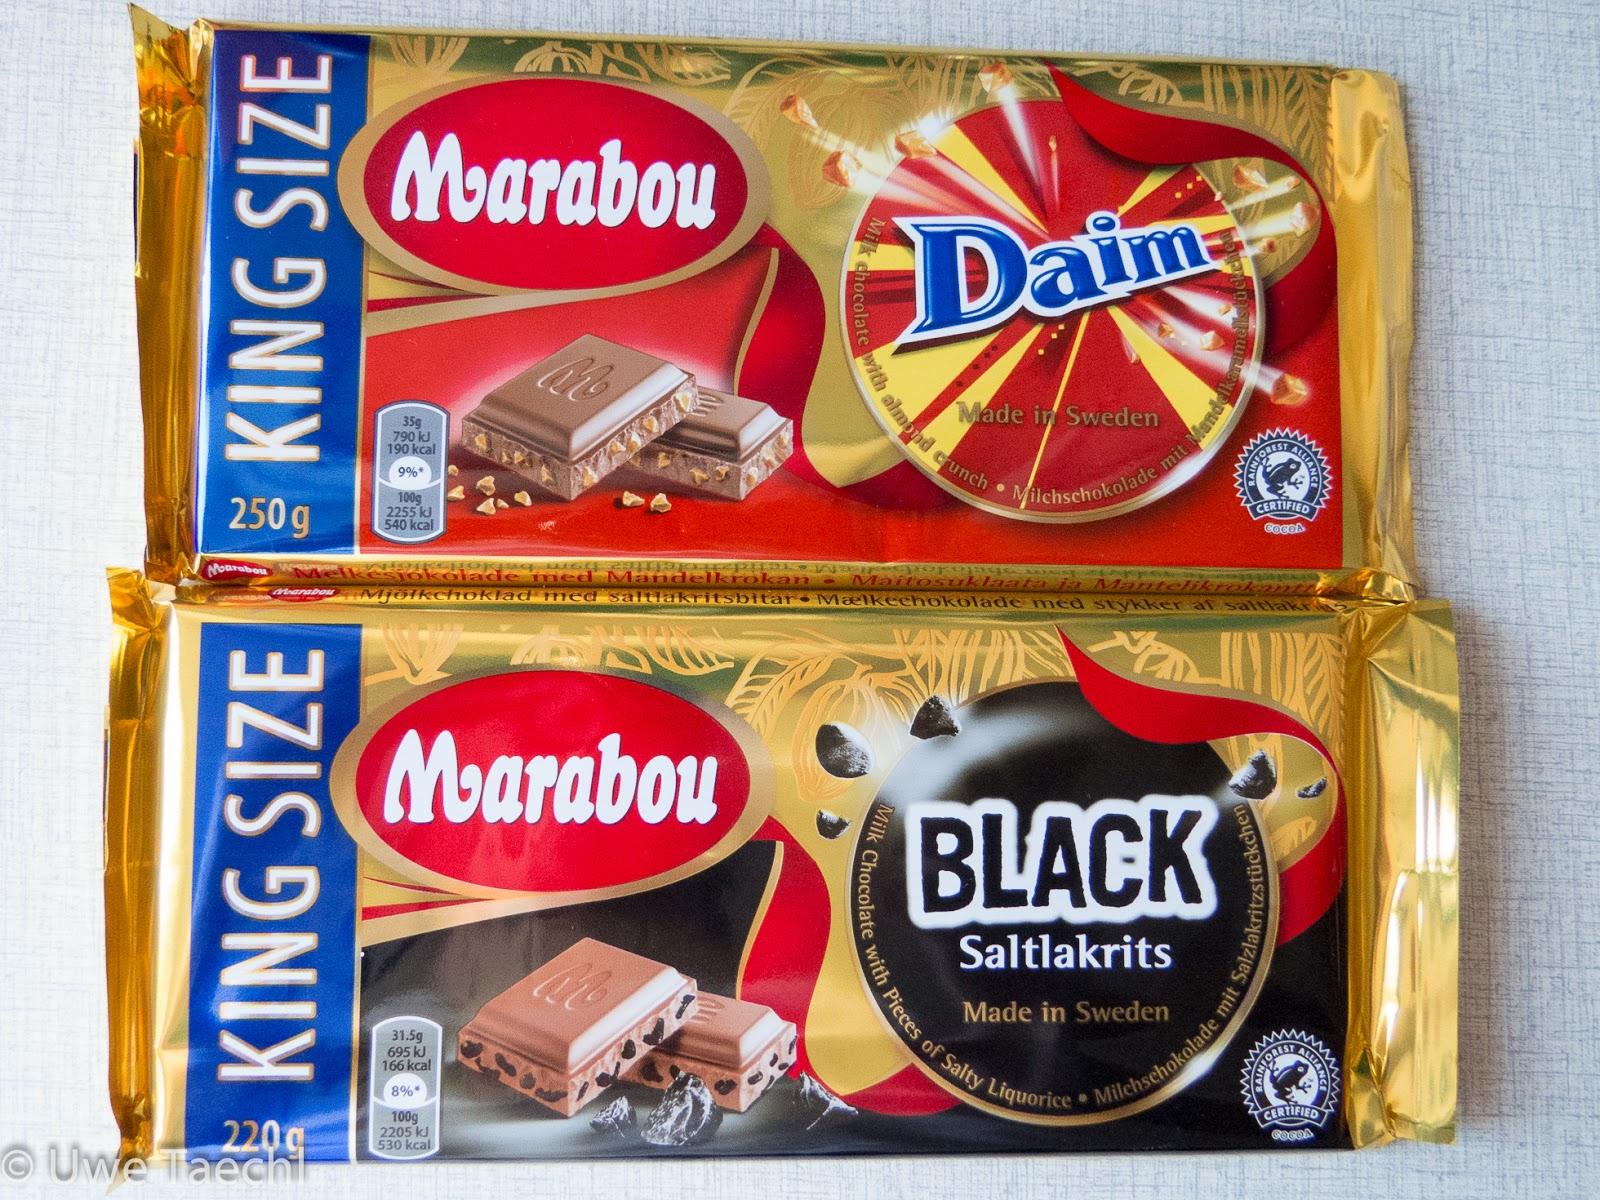 testing eins zwei test marabou schokolade daim black saltlakrits. Black Bedroom Furniture Sets. Home Design Ideas